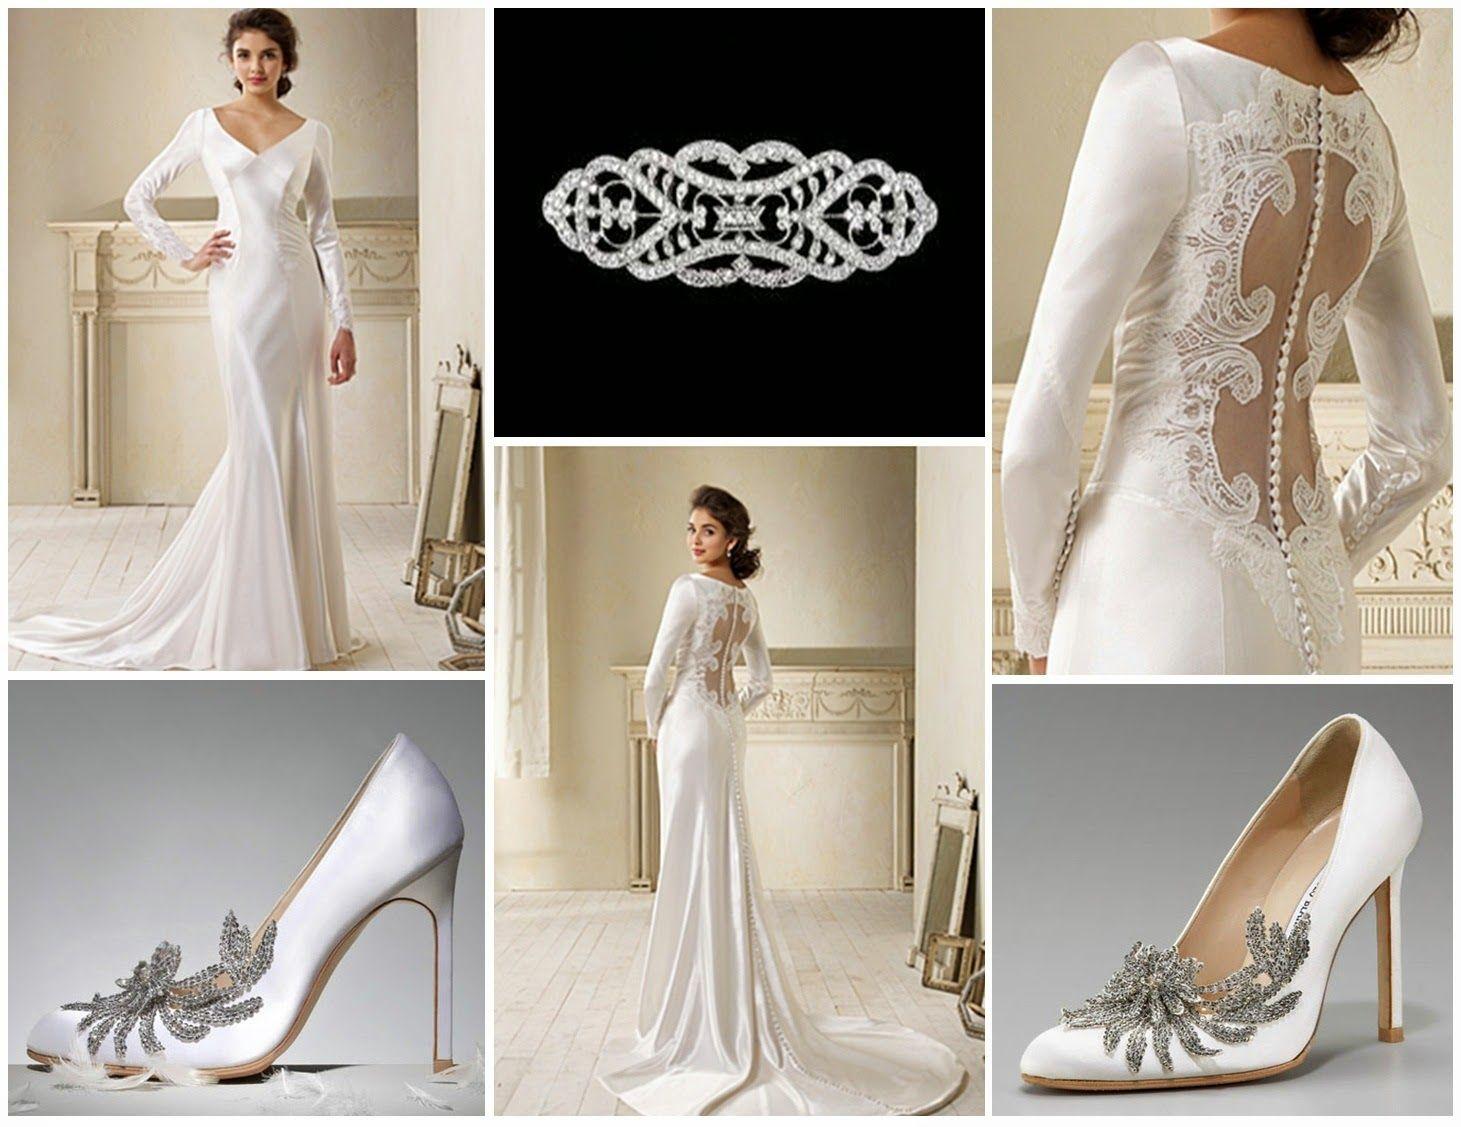 Bella Swan Wedding Dress Manolo Blahnik Shoes And Vintage Hair Do